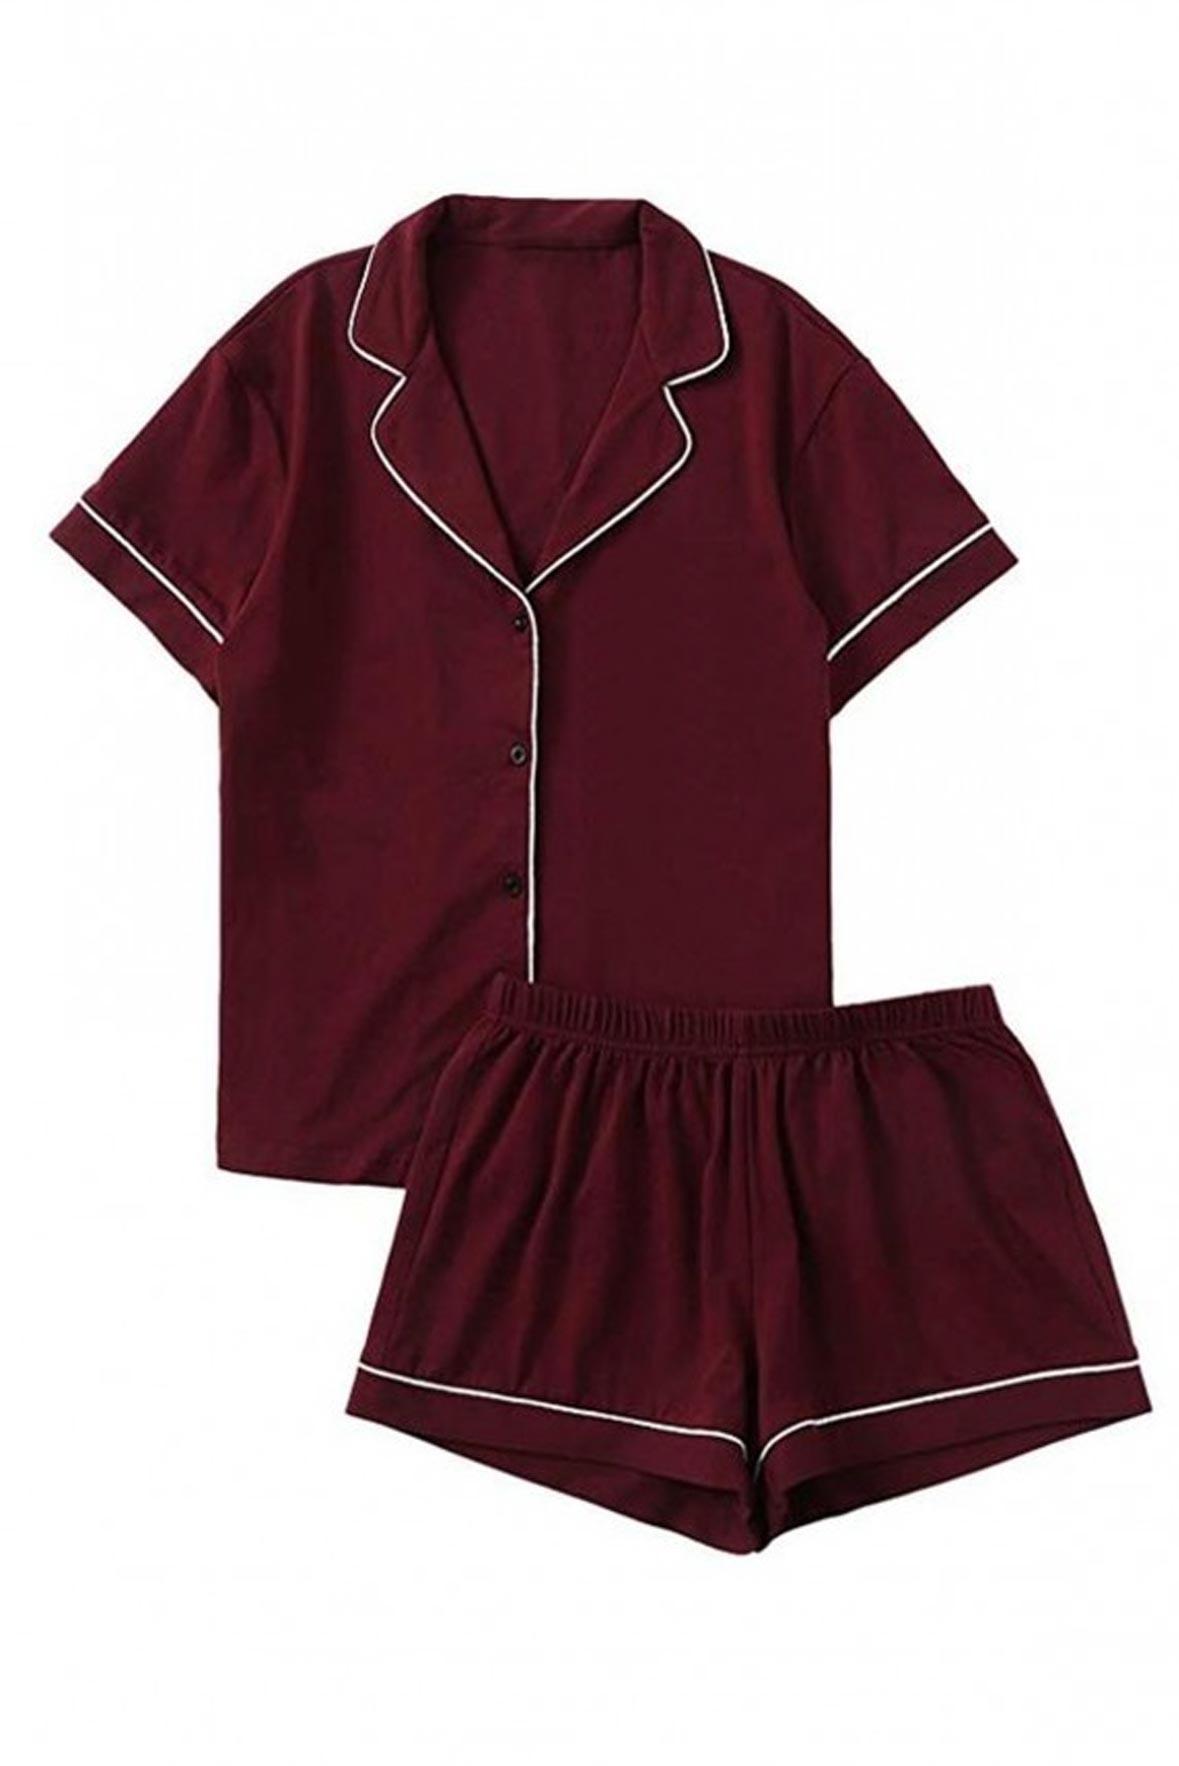 Set of 2 - Sleep Bright Nightwear Outfit Marsala